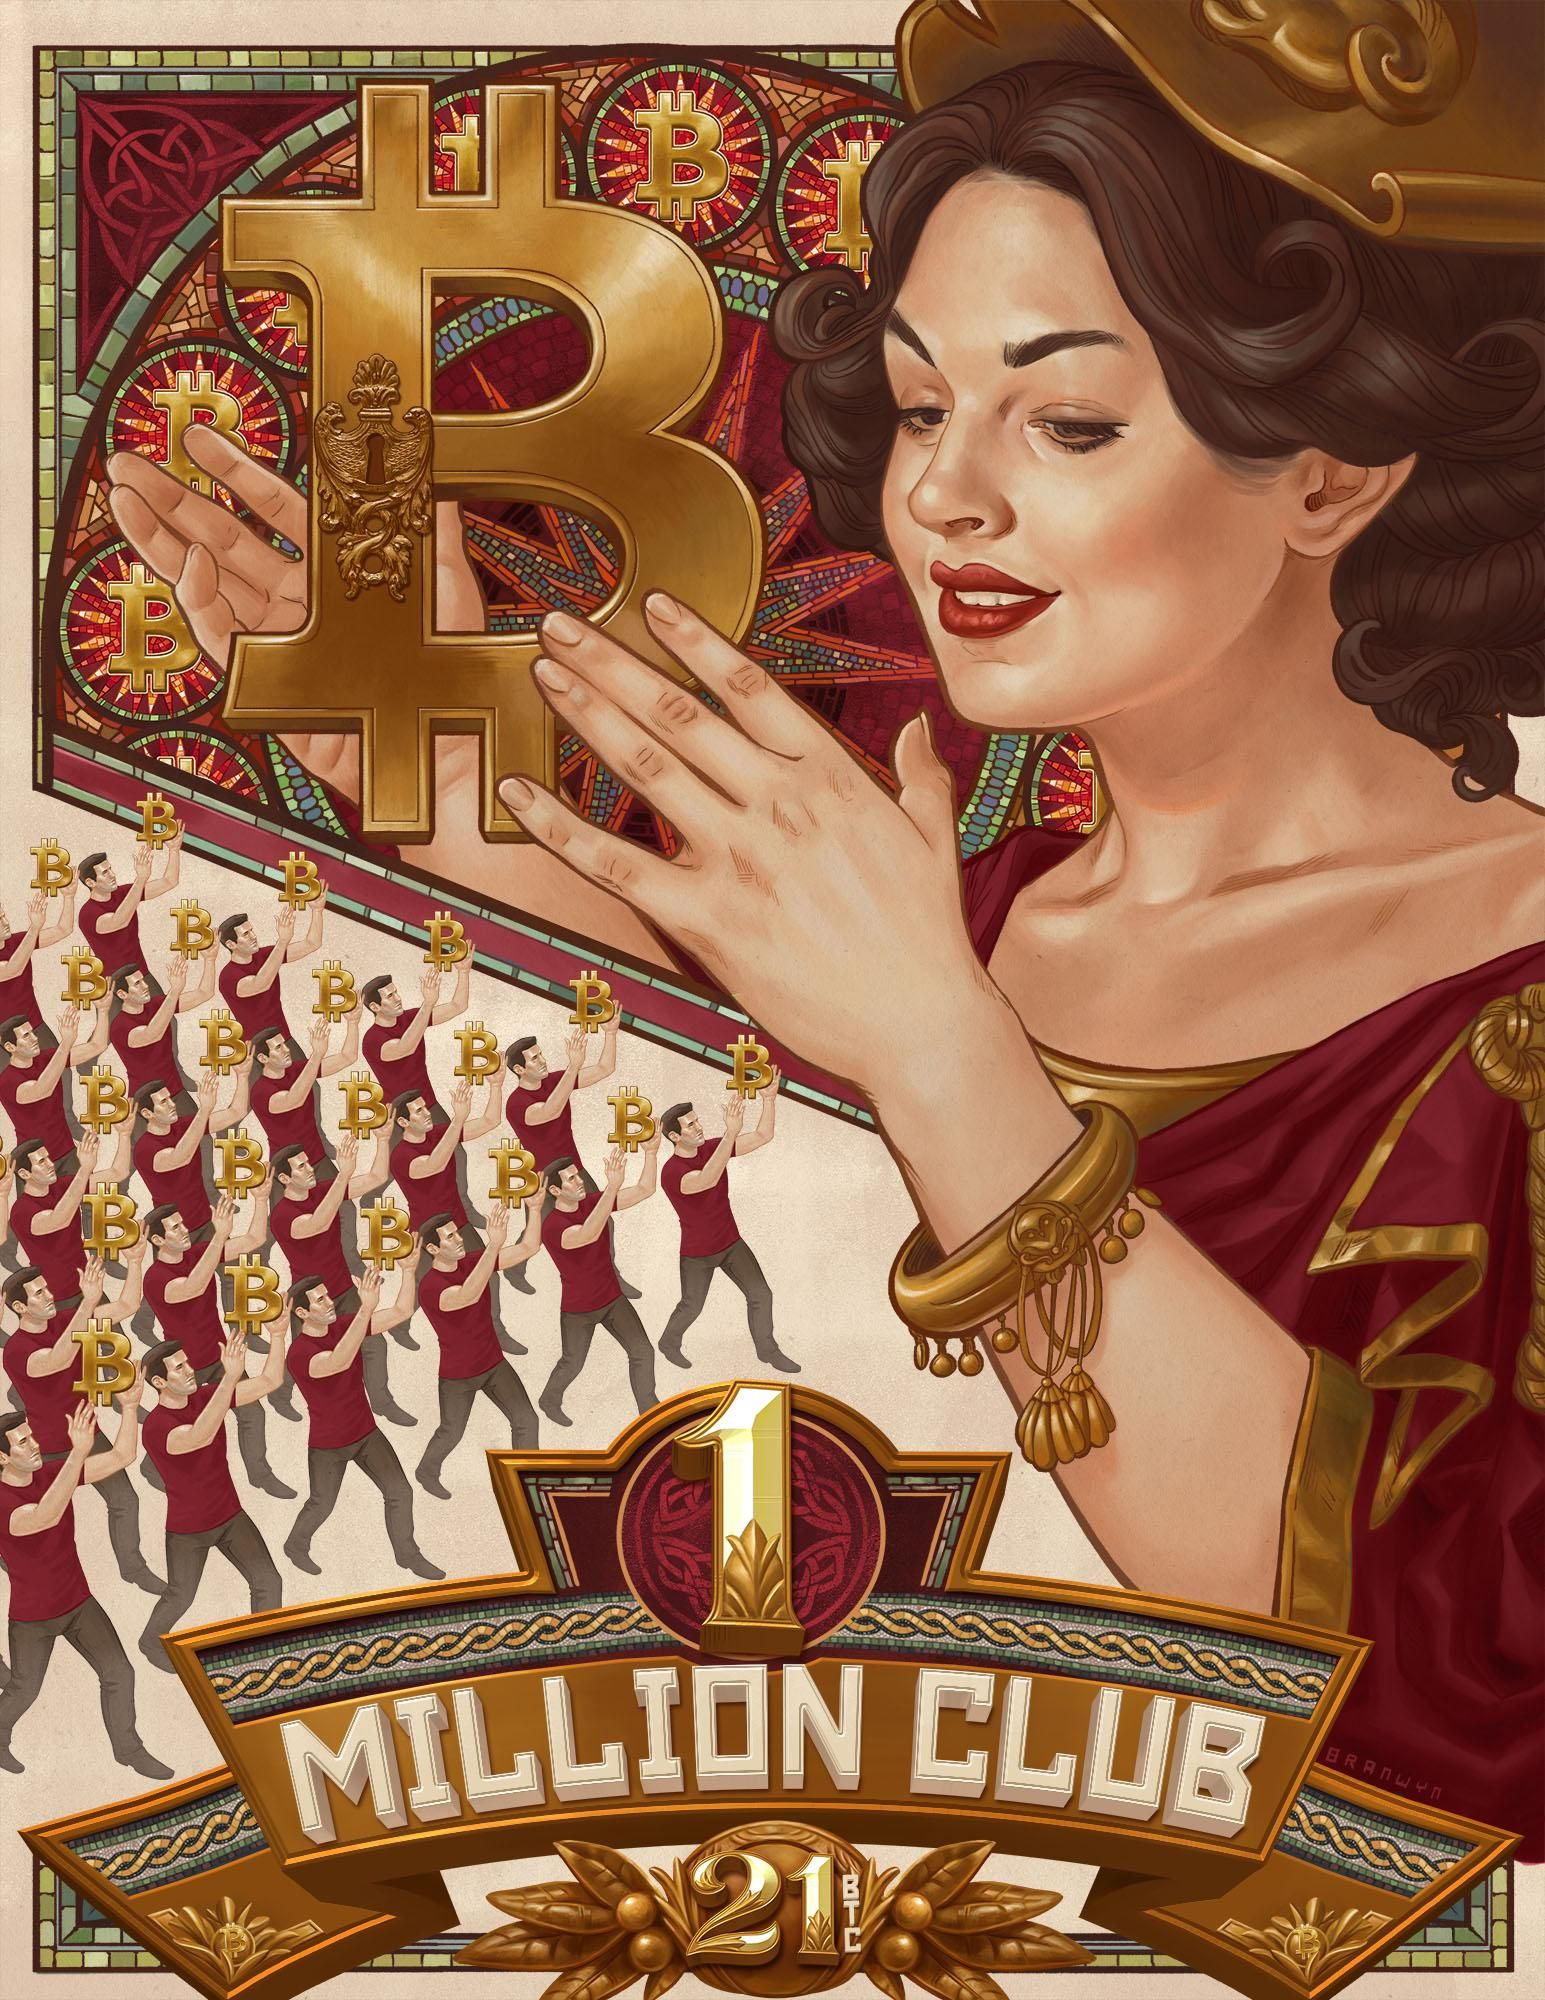 Monday Art Special 1 Million Club! Bitcoin, Bitcoin